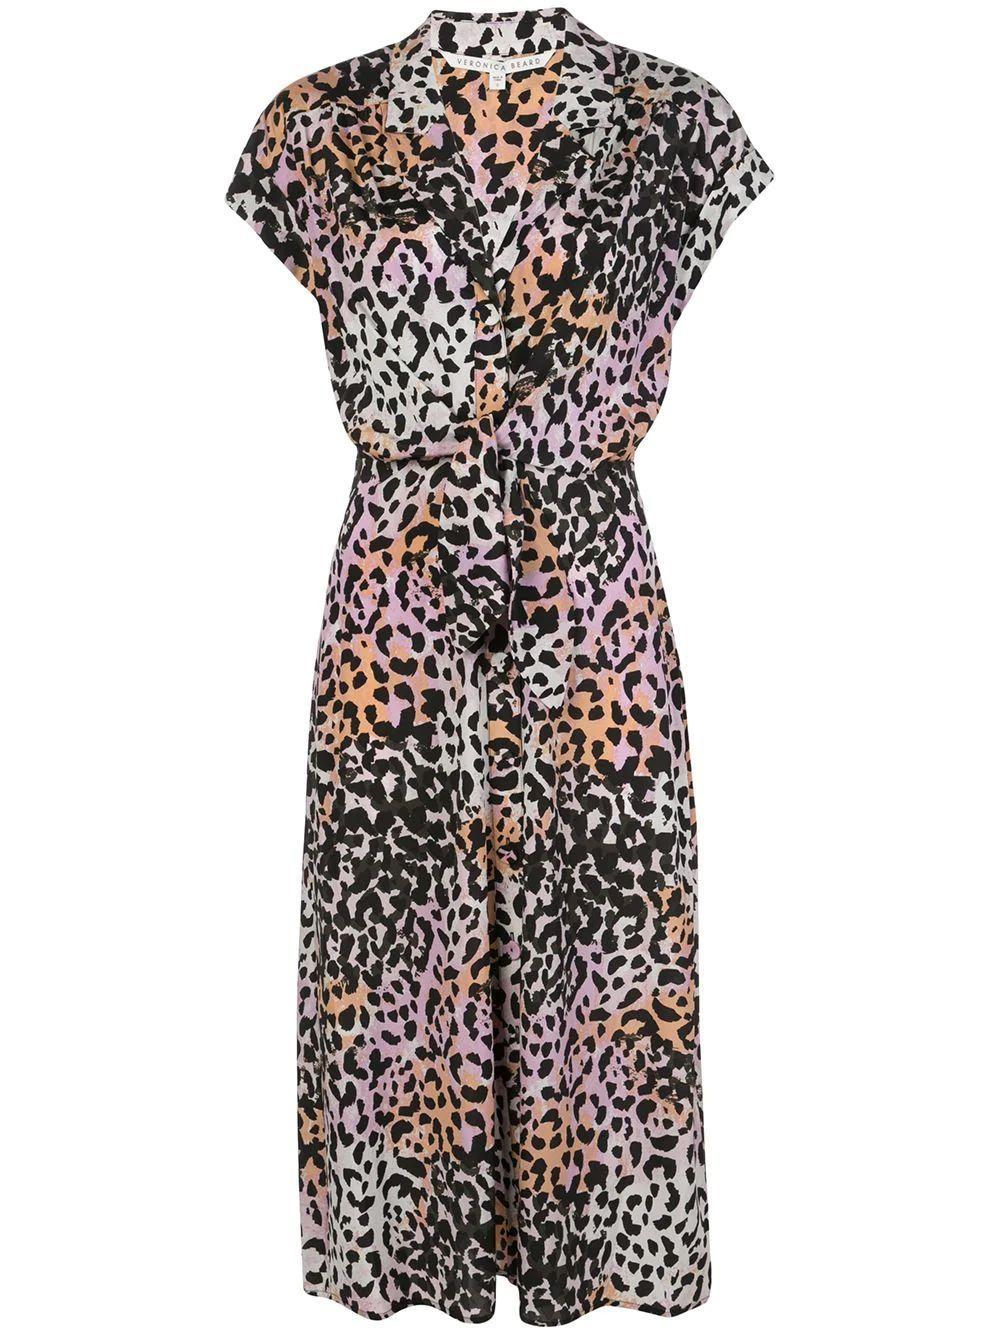 Amani Waist Tie Midi Dress Item # 2003SDC032820